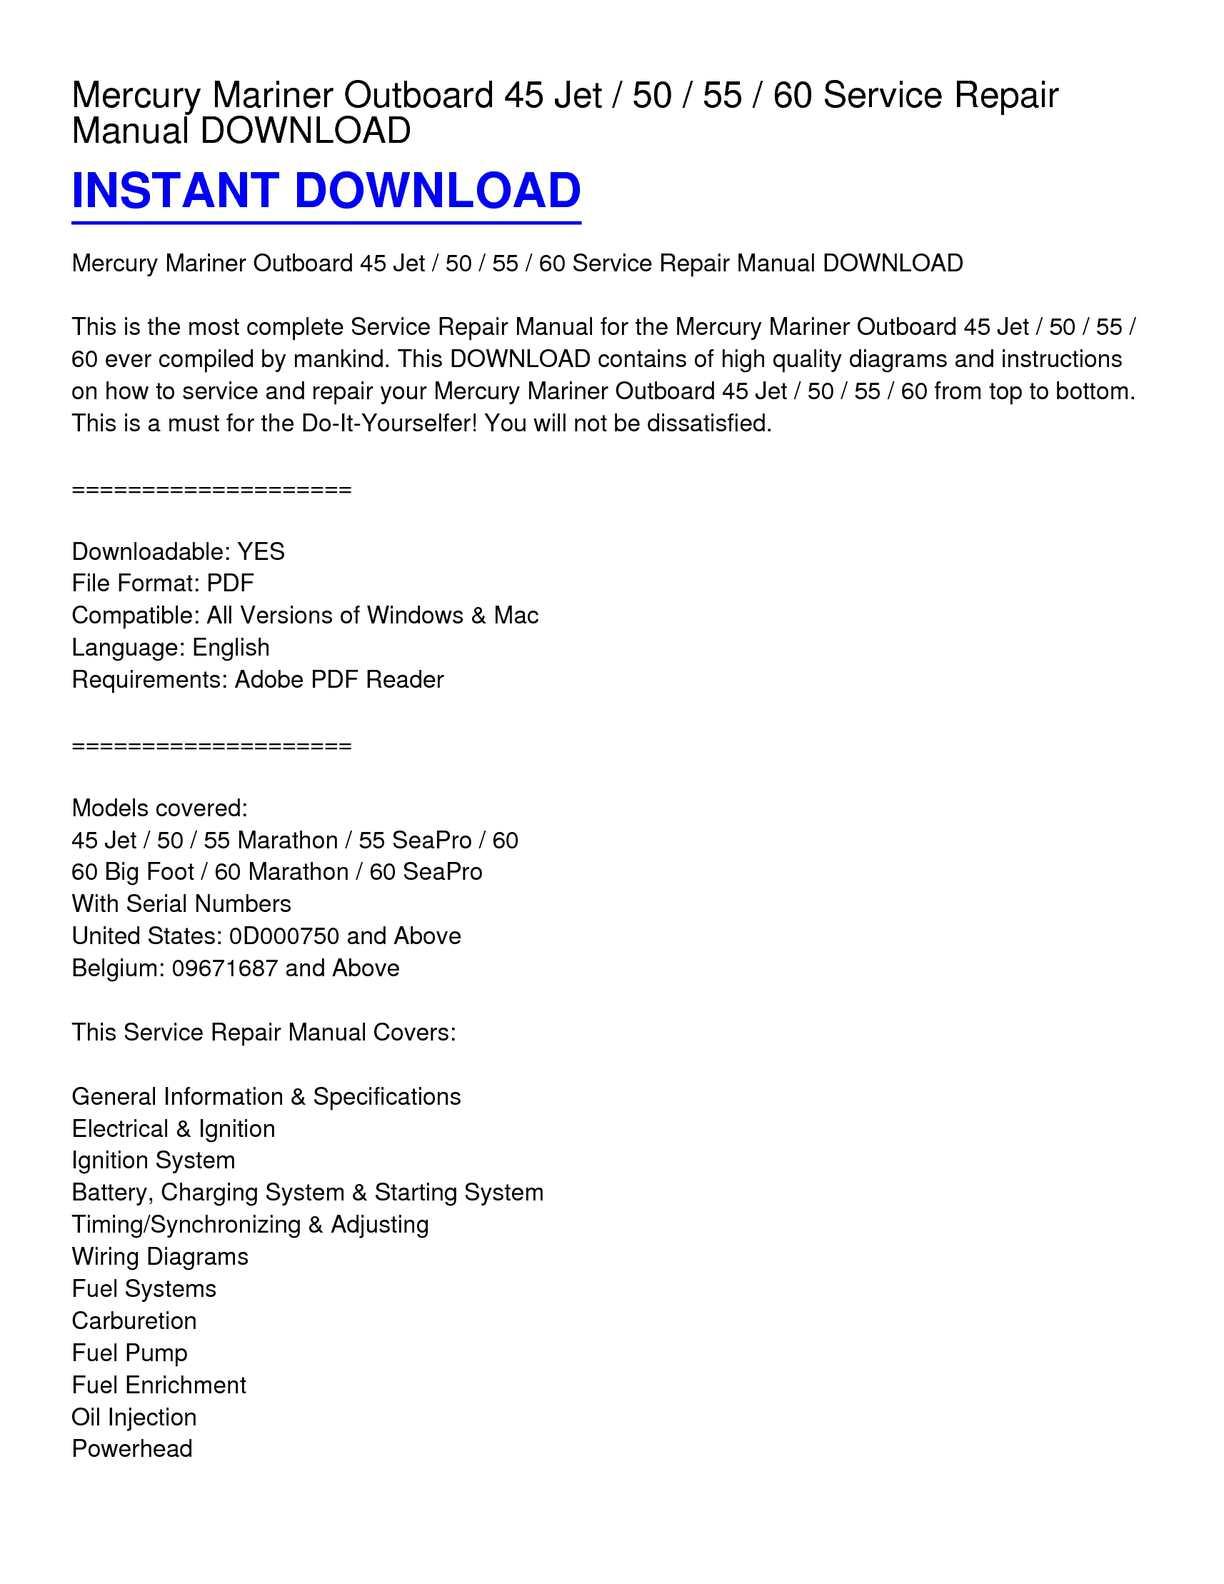 Calaméo - Mercury Mariner Outboard 45 Jet _ 50 _ 55 _ 60 Service Repair  Manual DOWNLOAD